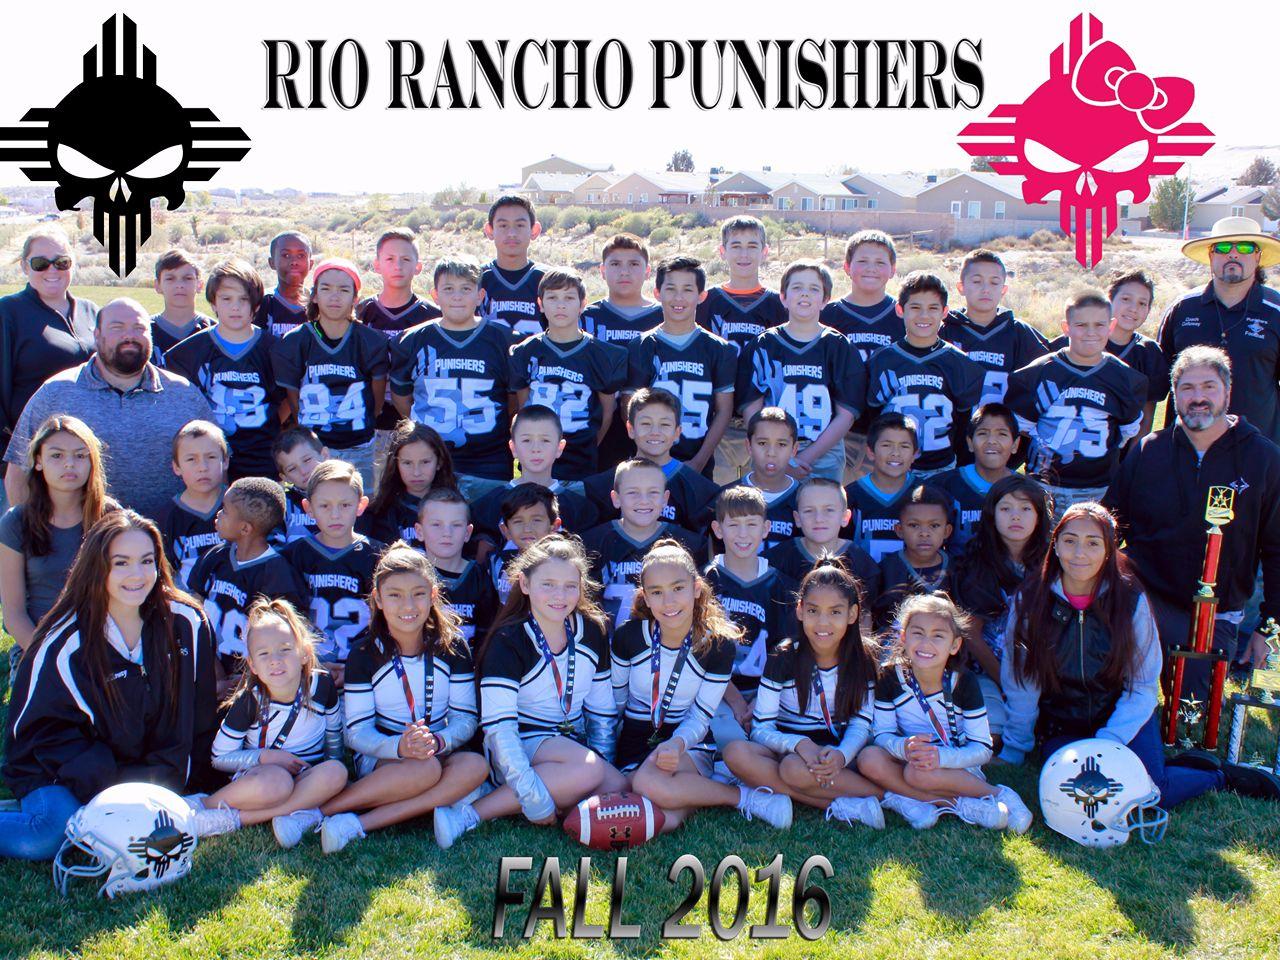 Rio Rancho Punishers Football/Cheer